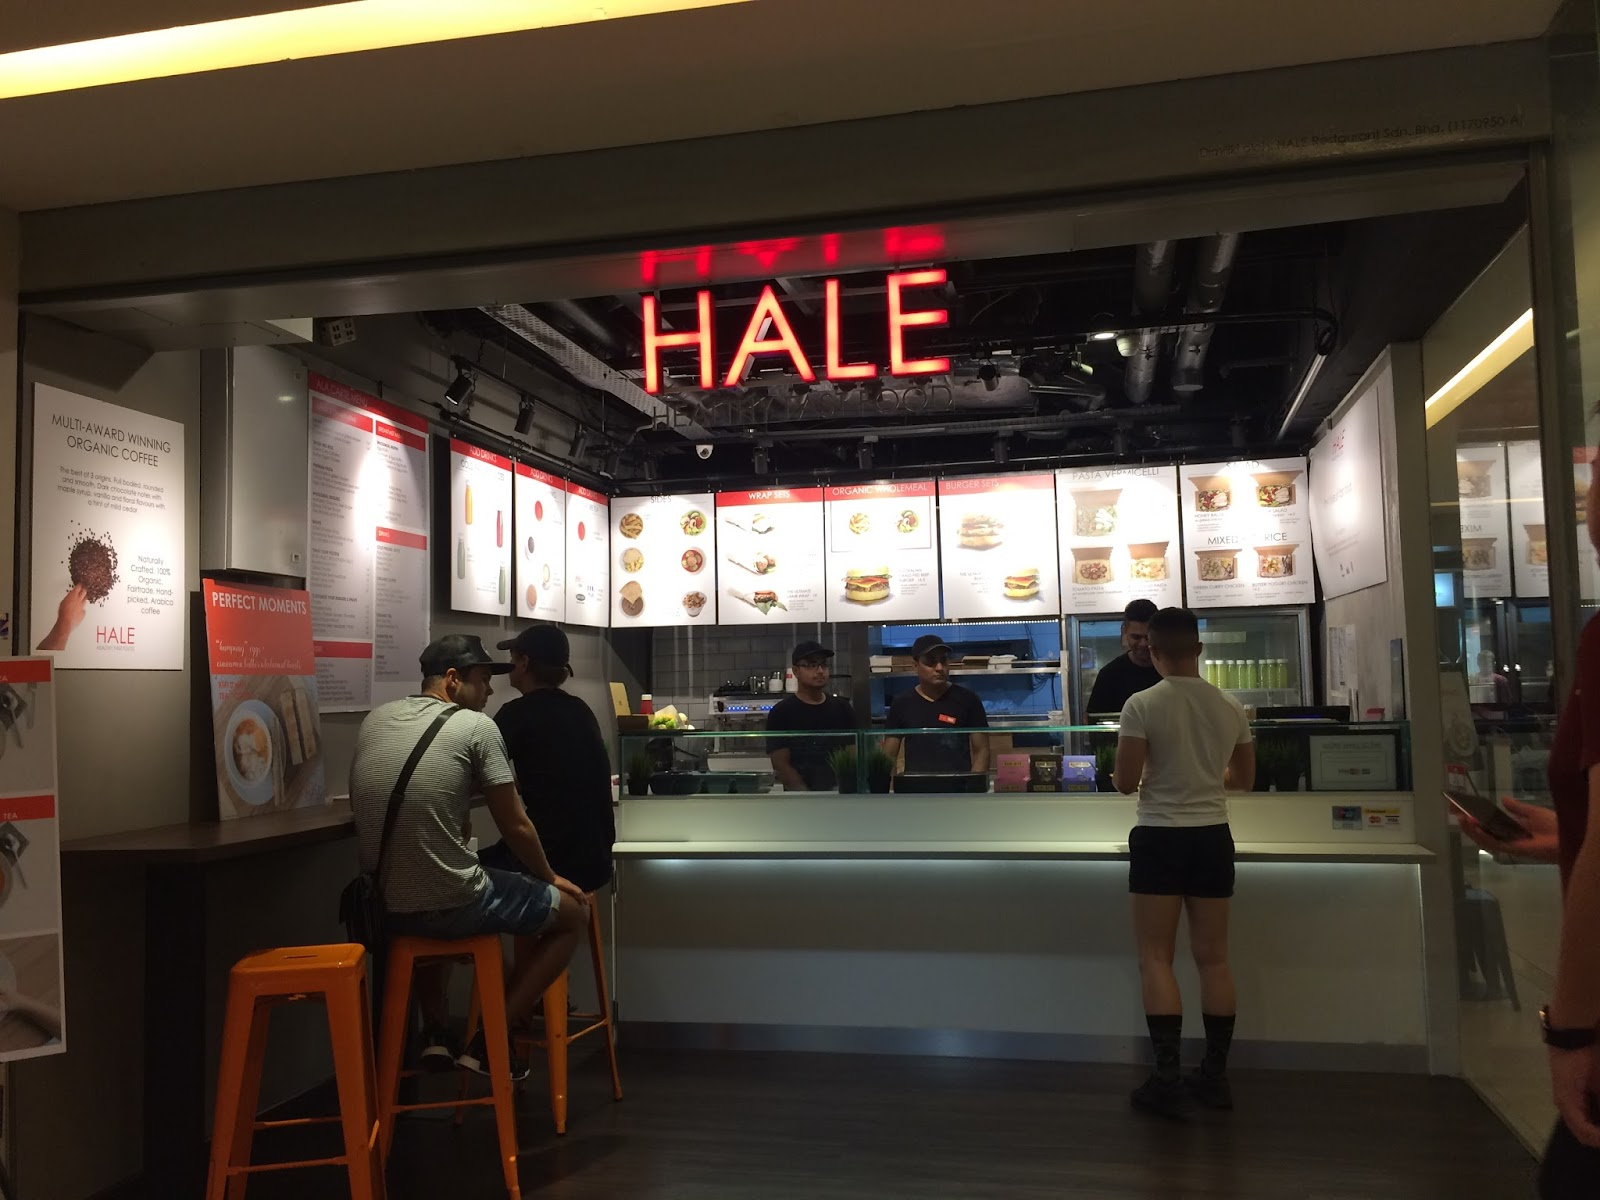 Healthiest Fast Food Restaurants 2017